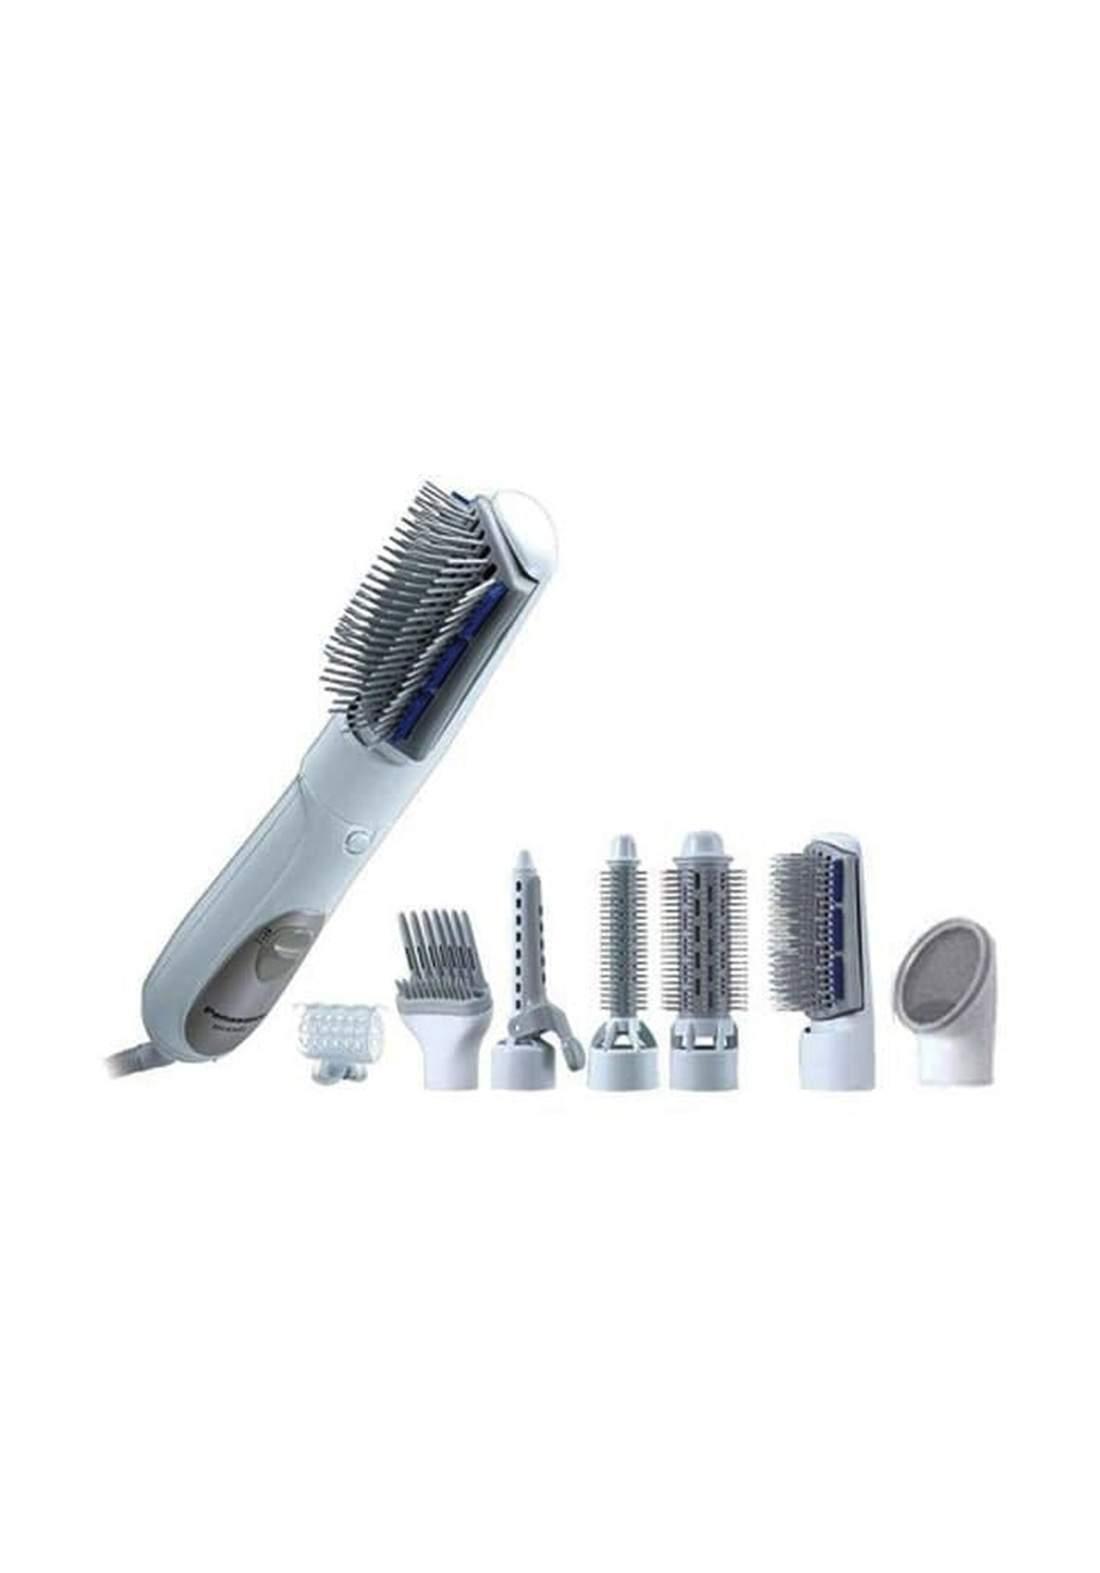 Panasonic-EH-KA81-W615 Multi-Hair Styler  مجموعة تصفيف الشعر